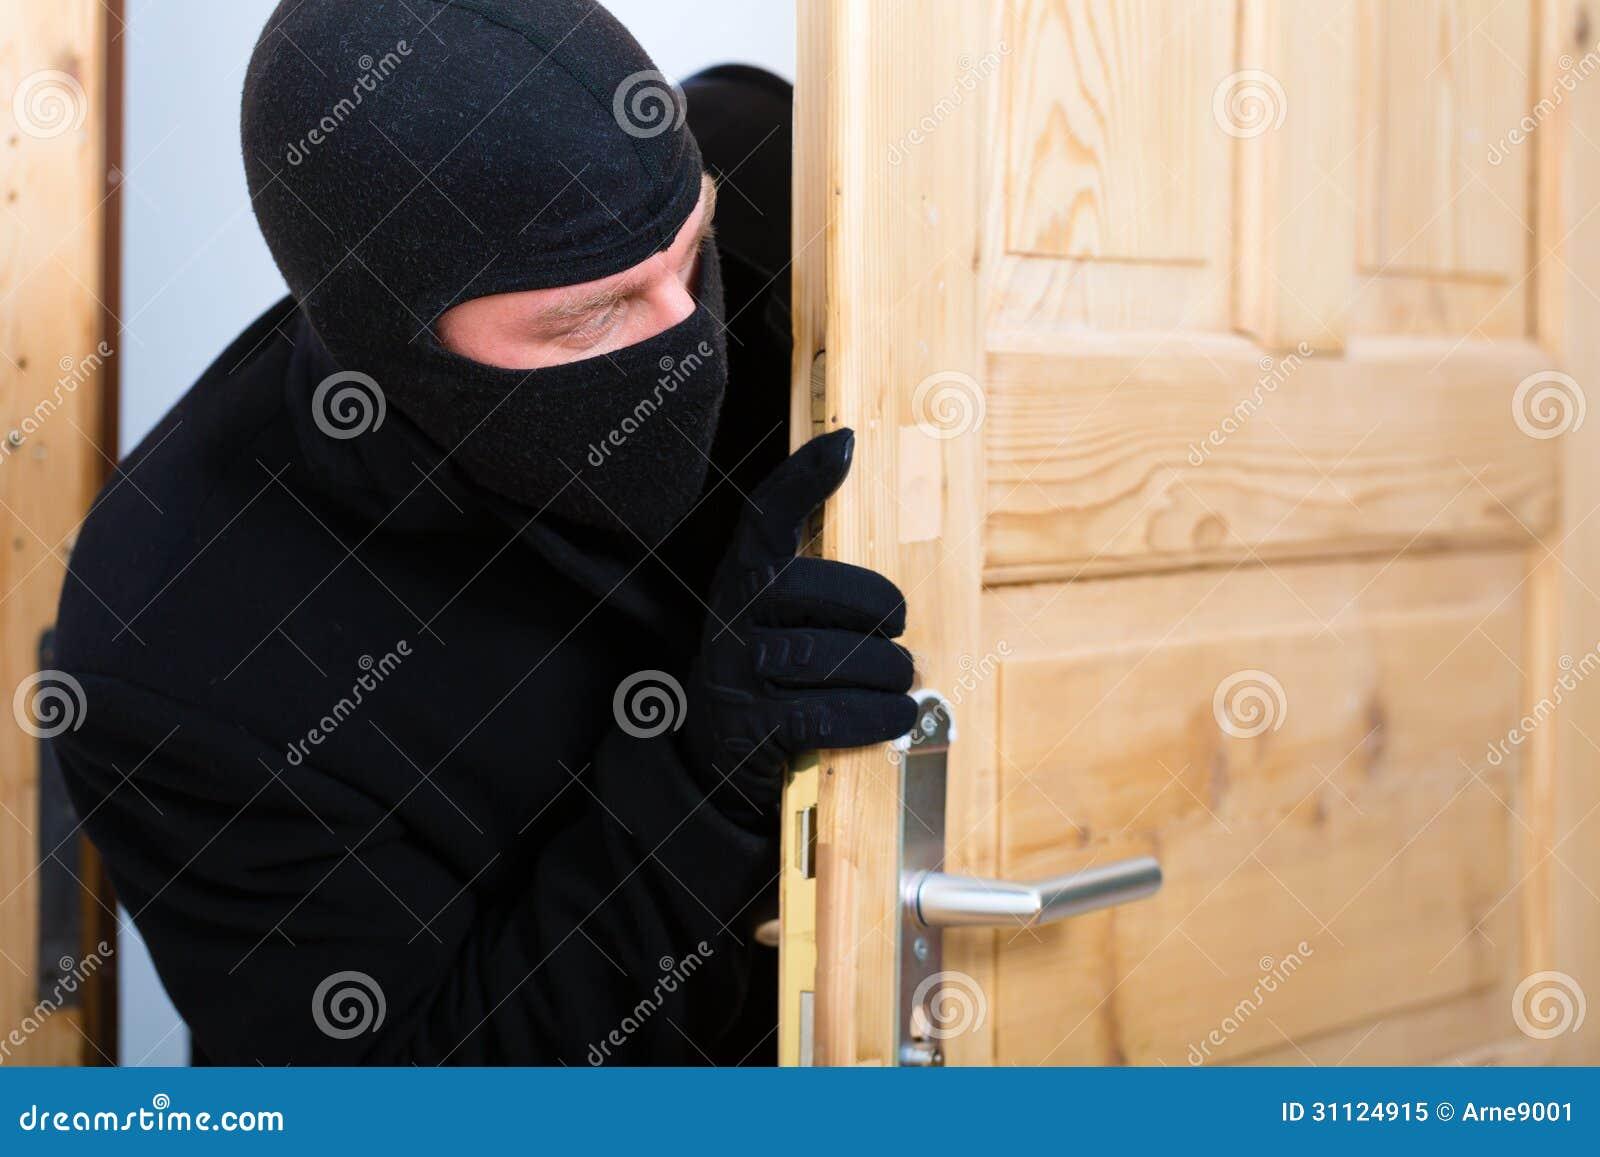 Burglary Crime Burglar Opening A Door Stock Image